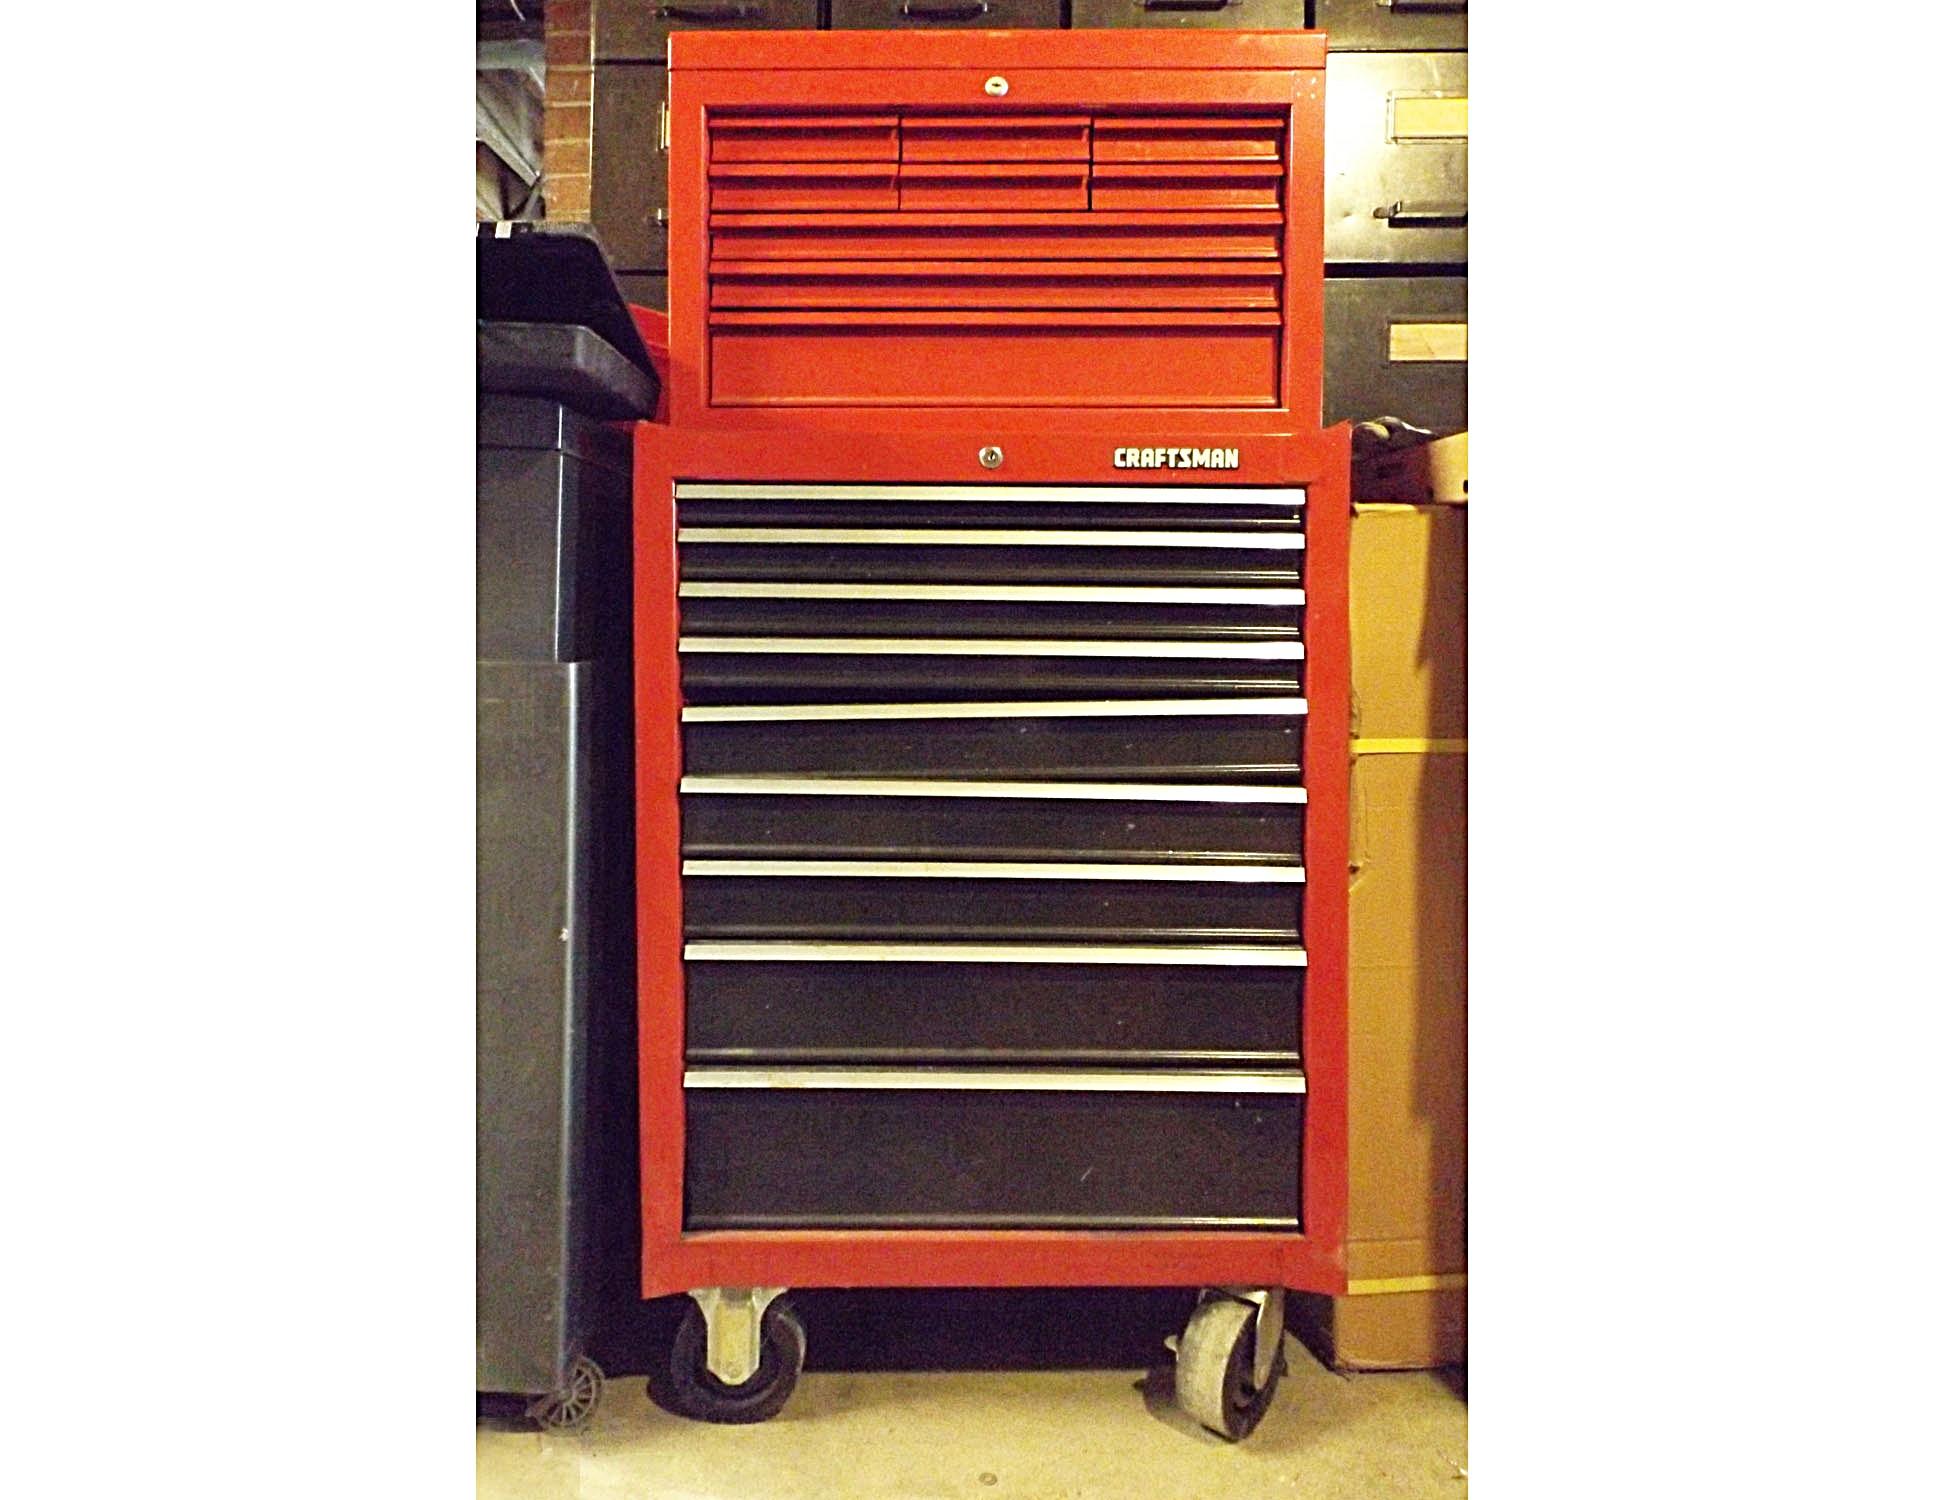 Craftsman 9-Drawer Rolling Tool Cabinet/Upper Tool Box + Tools : EBTH